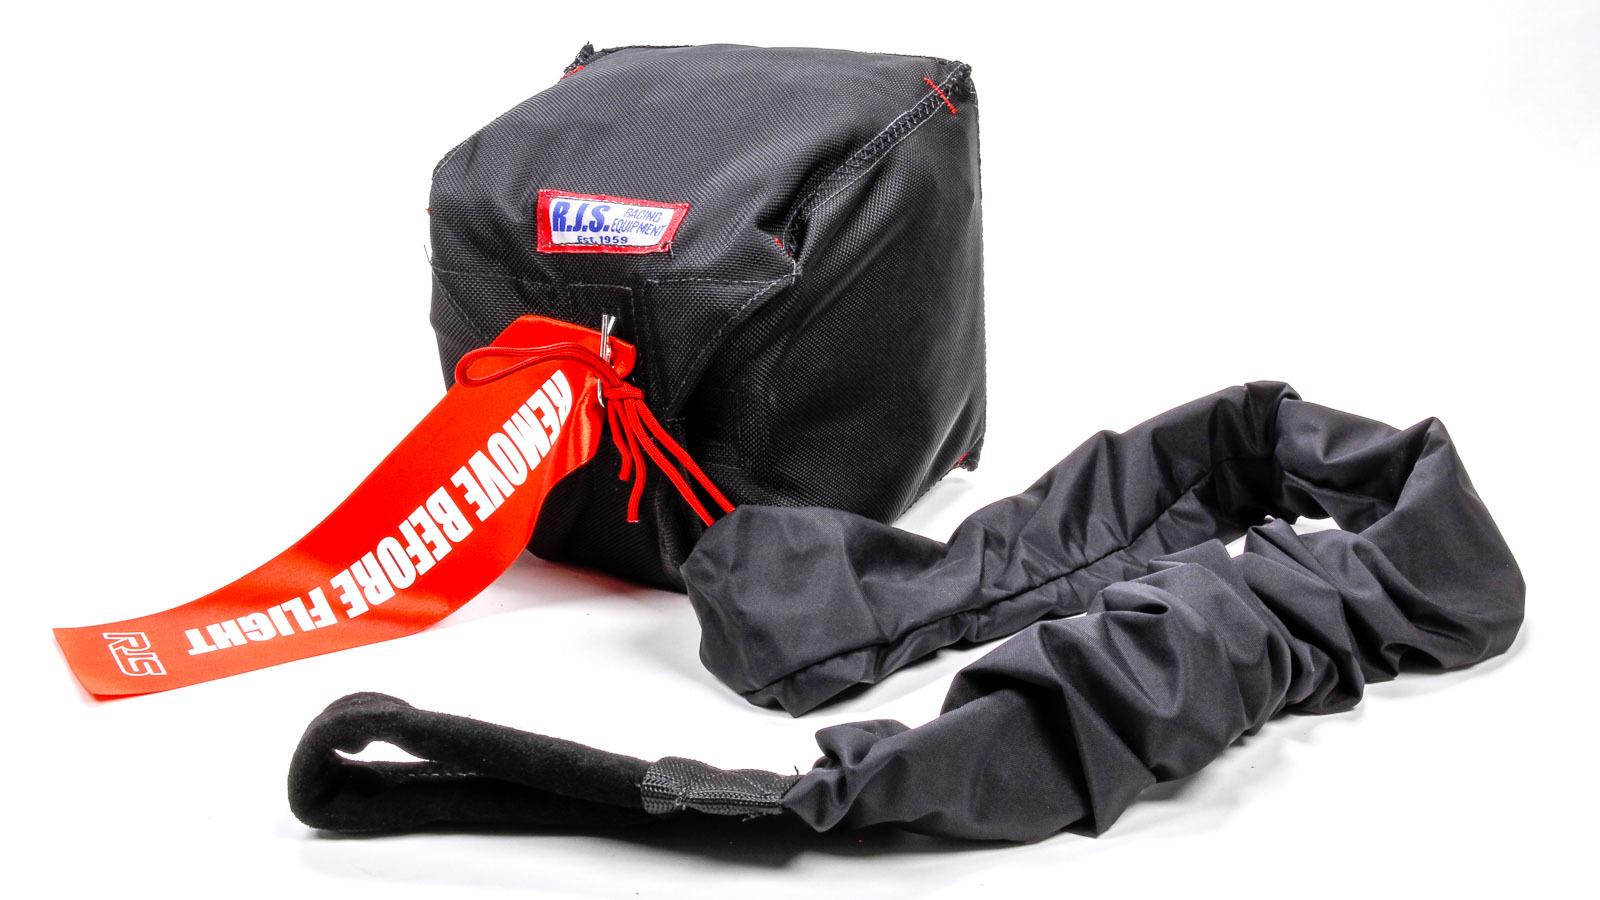 Rjs Safety Sportsman Chute W/ Nylon Bag and Pilot Black